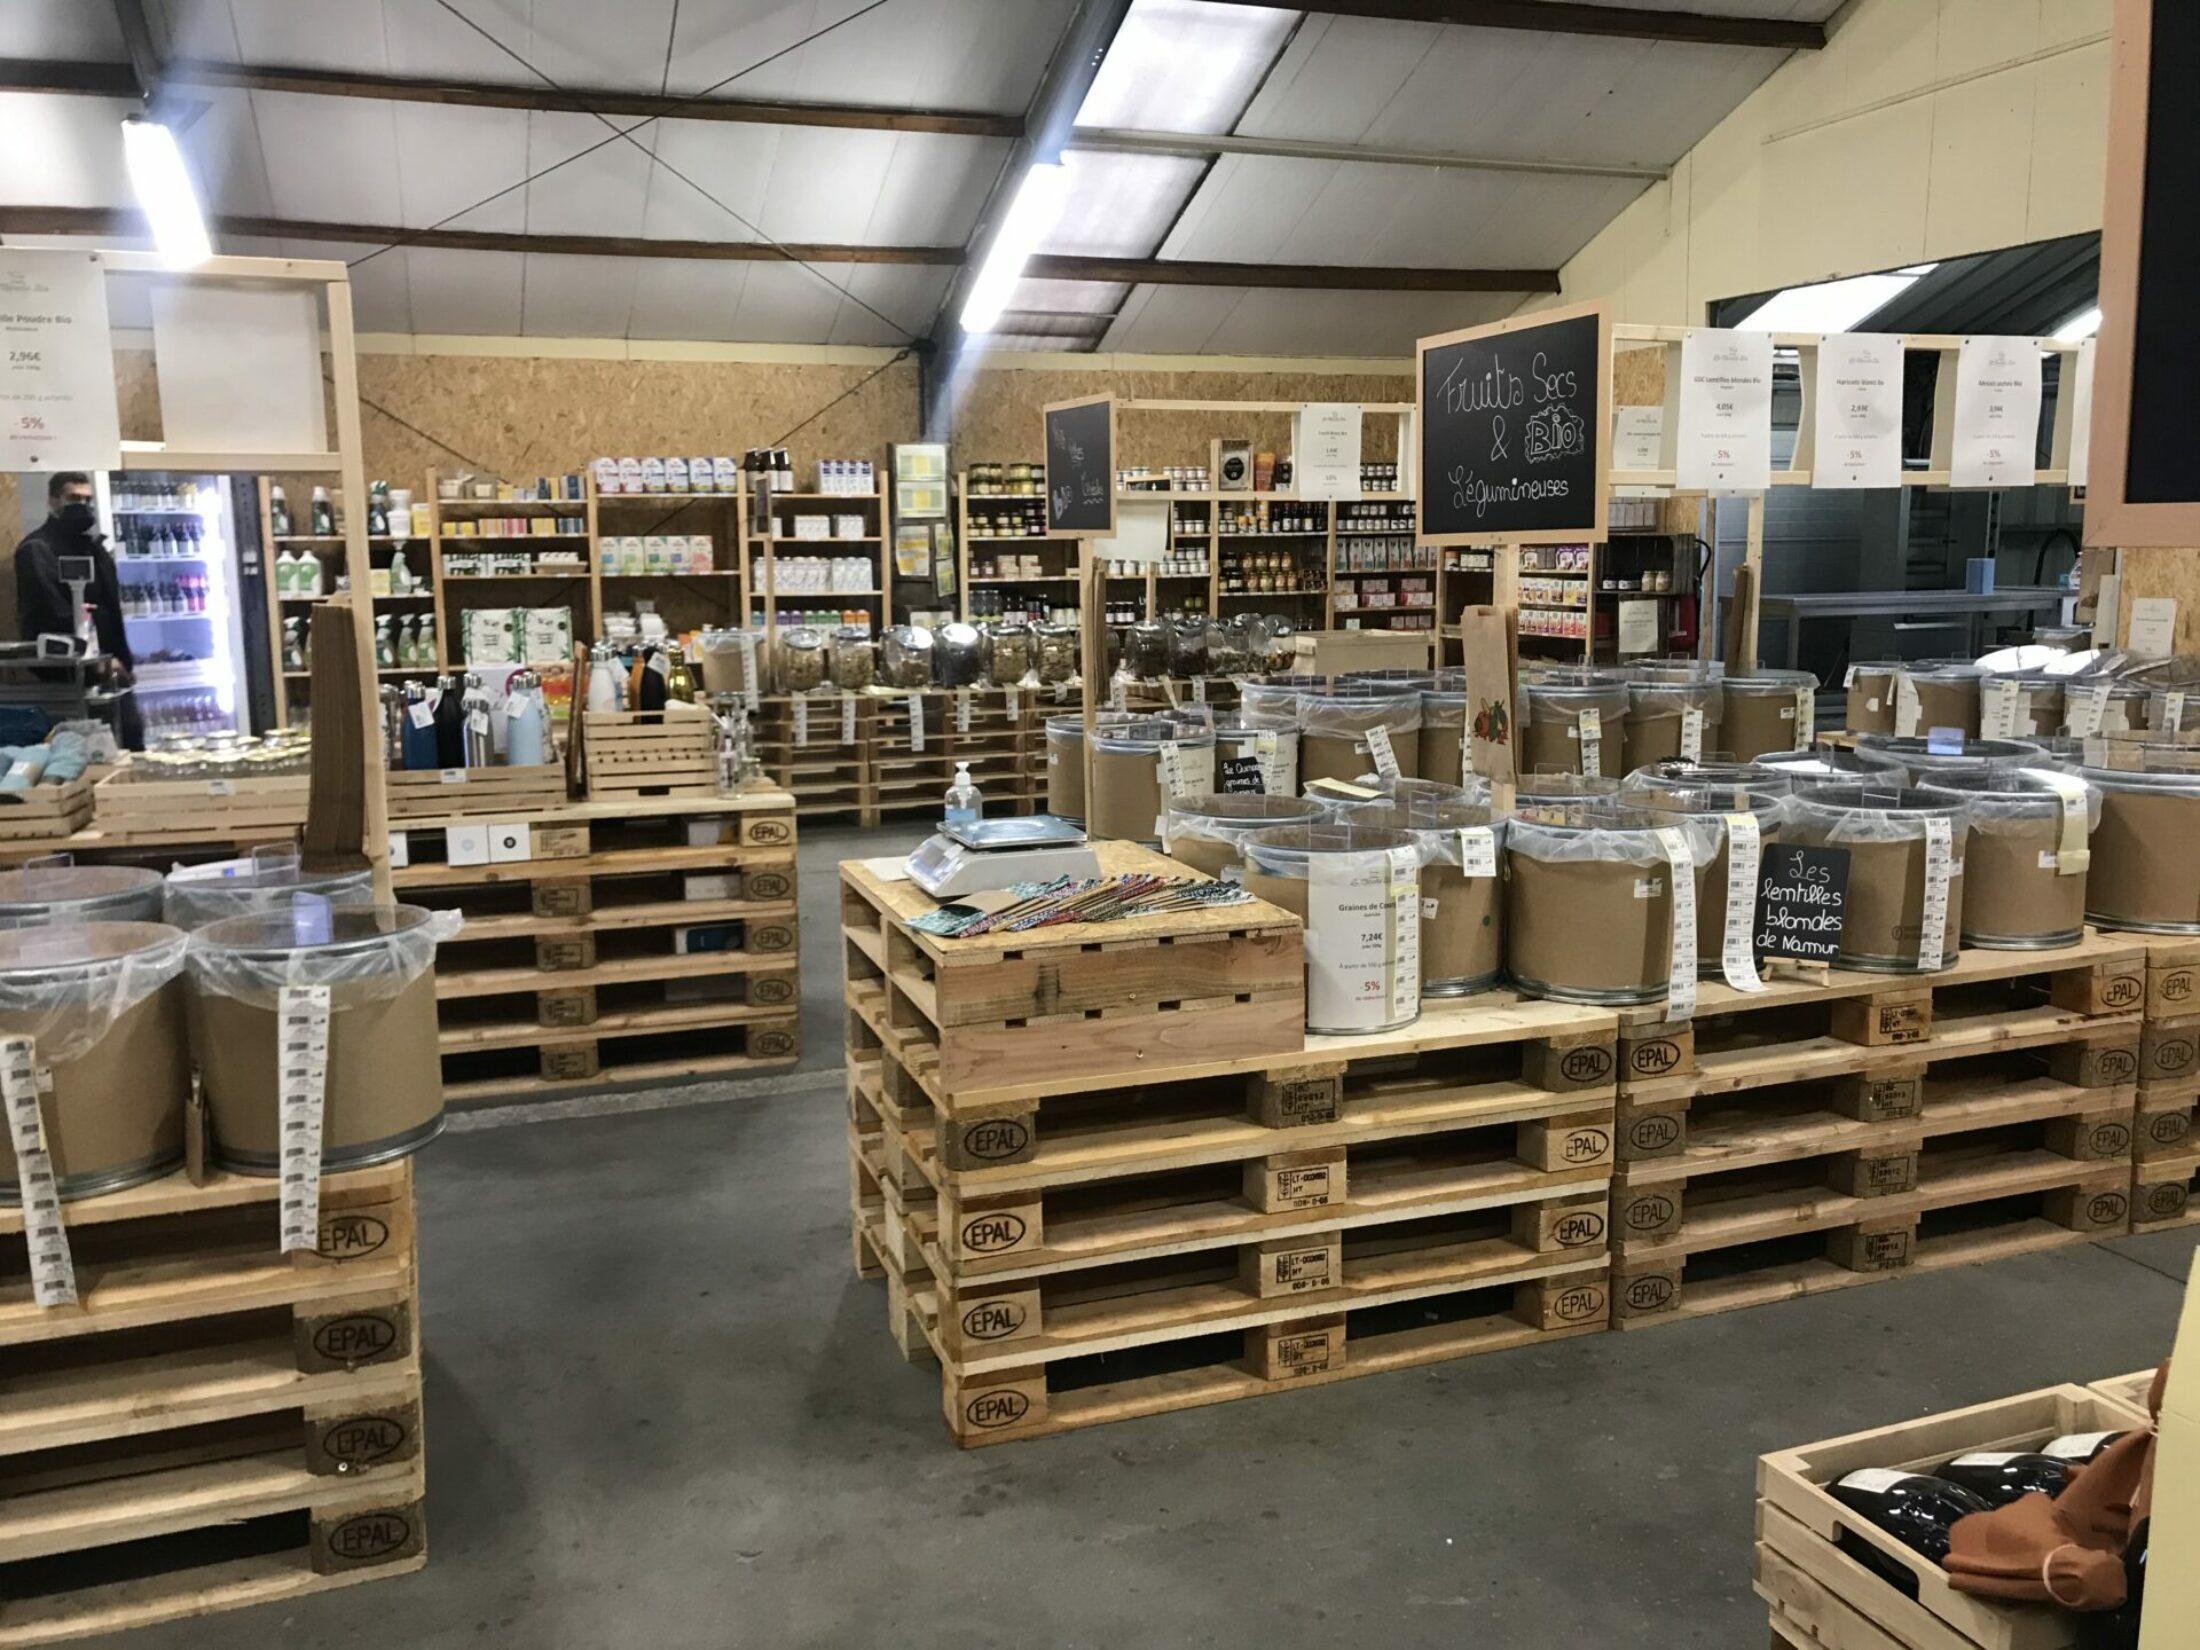 Fresho: supplier of fresh and organic produce